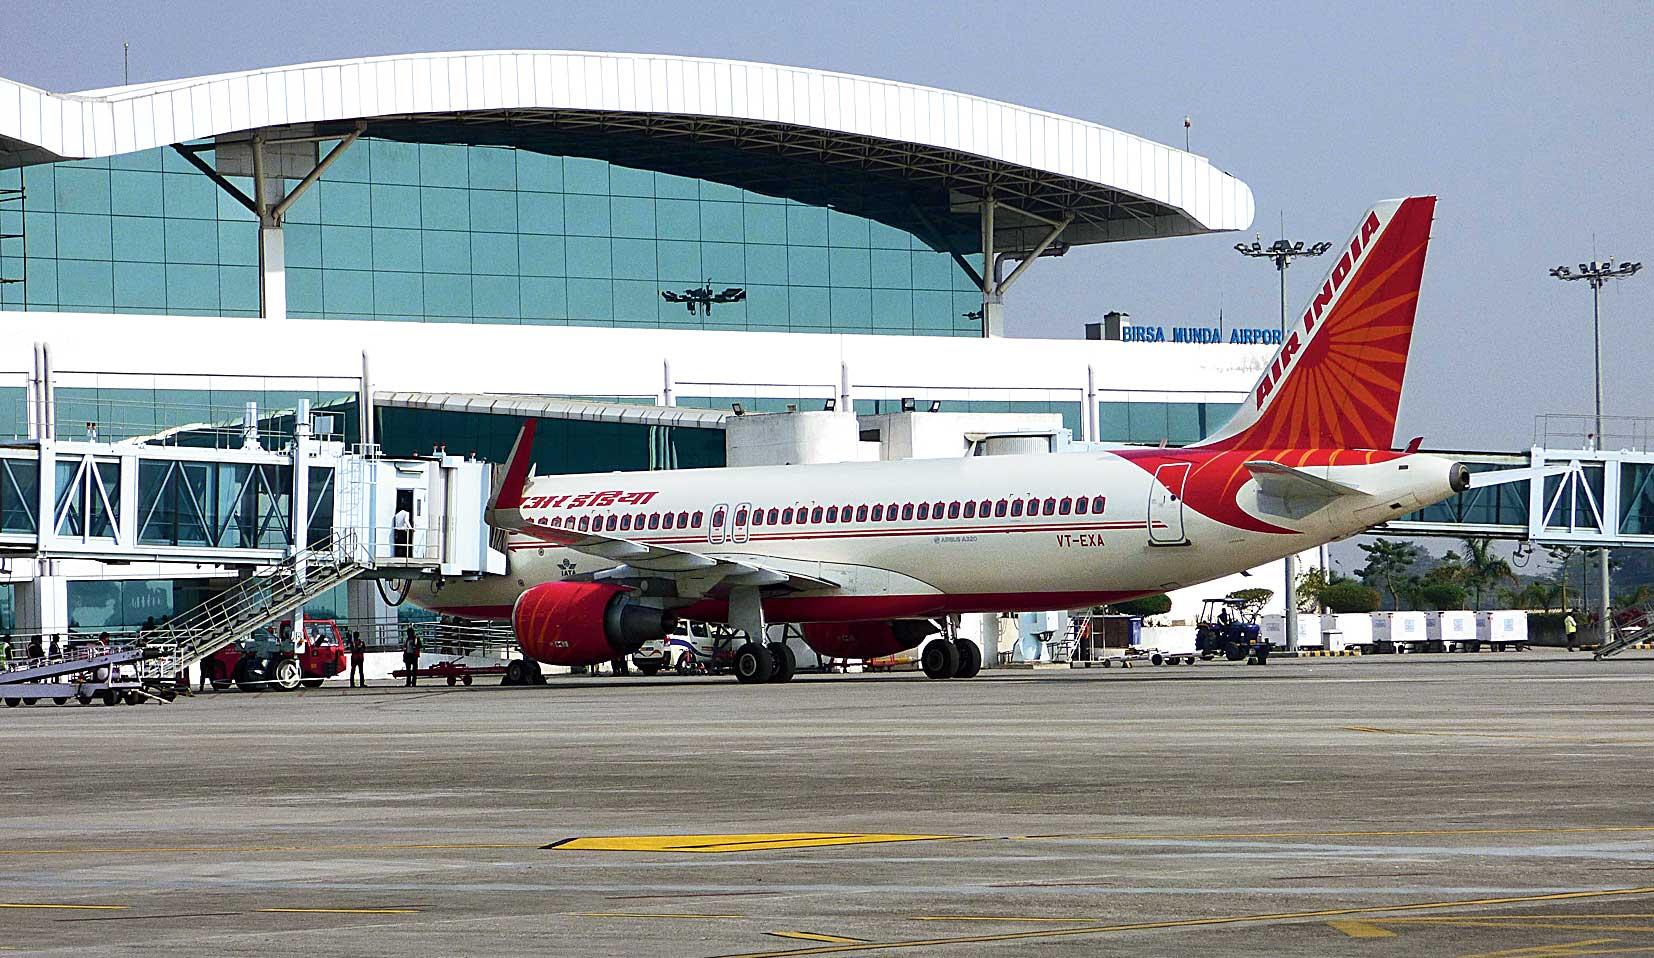 The existing apron at Birsa Munda Airport in Ranchi